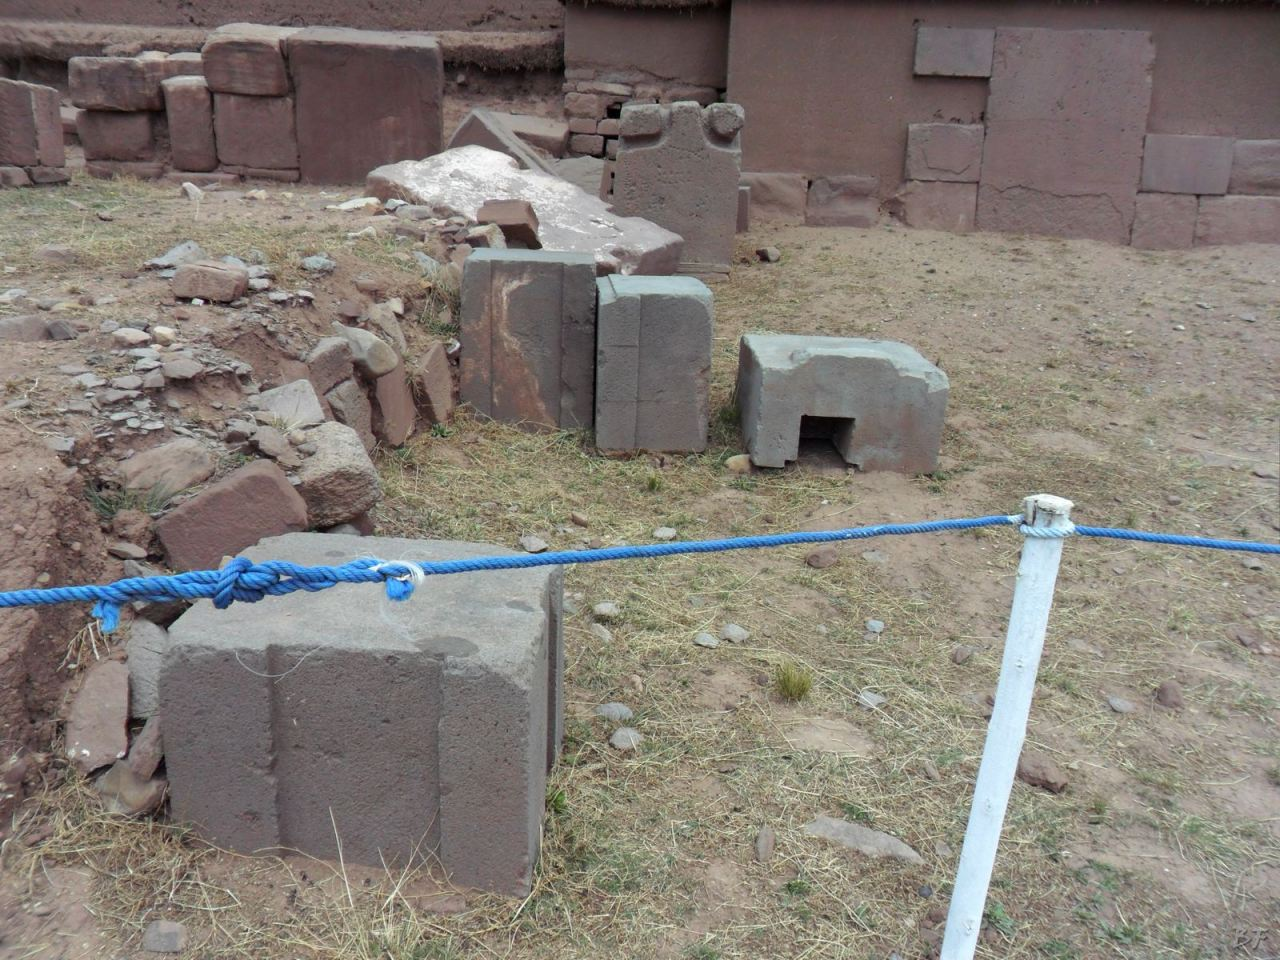 Sito-Megalitico-Piramide-Akapana-Kalasasaya-Menhir-Tiahuanaco-Bolivia-67